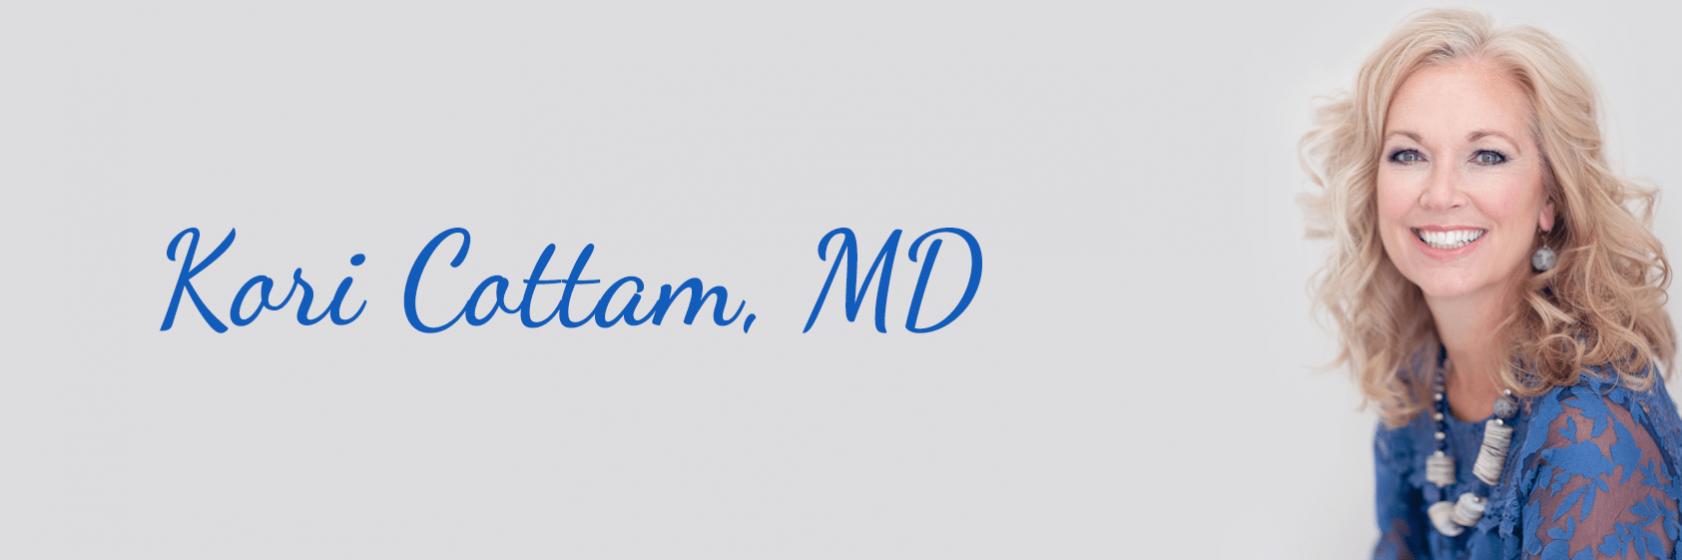 cottam-banner